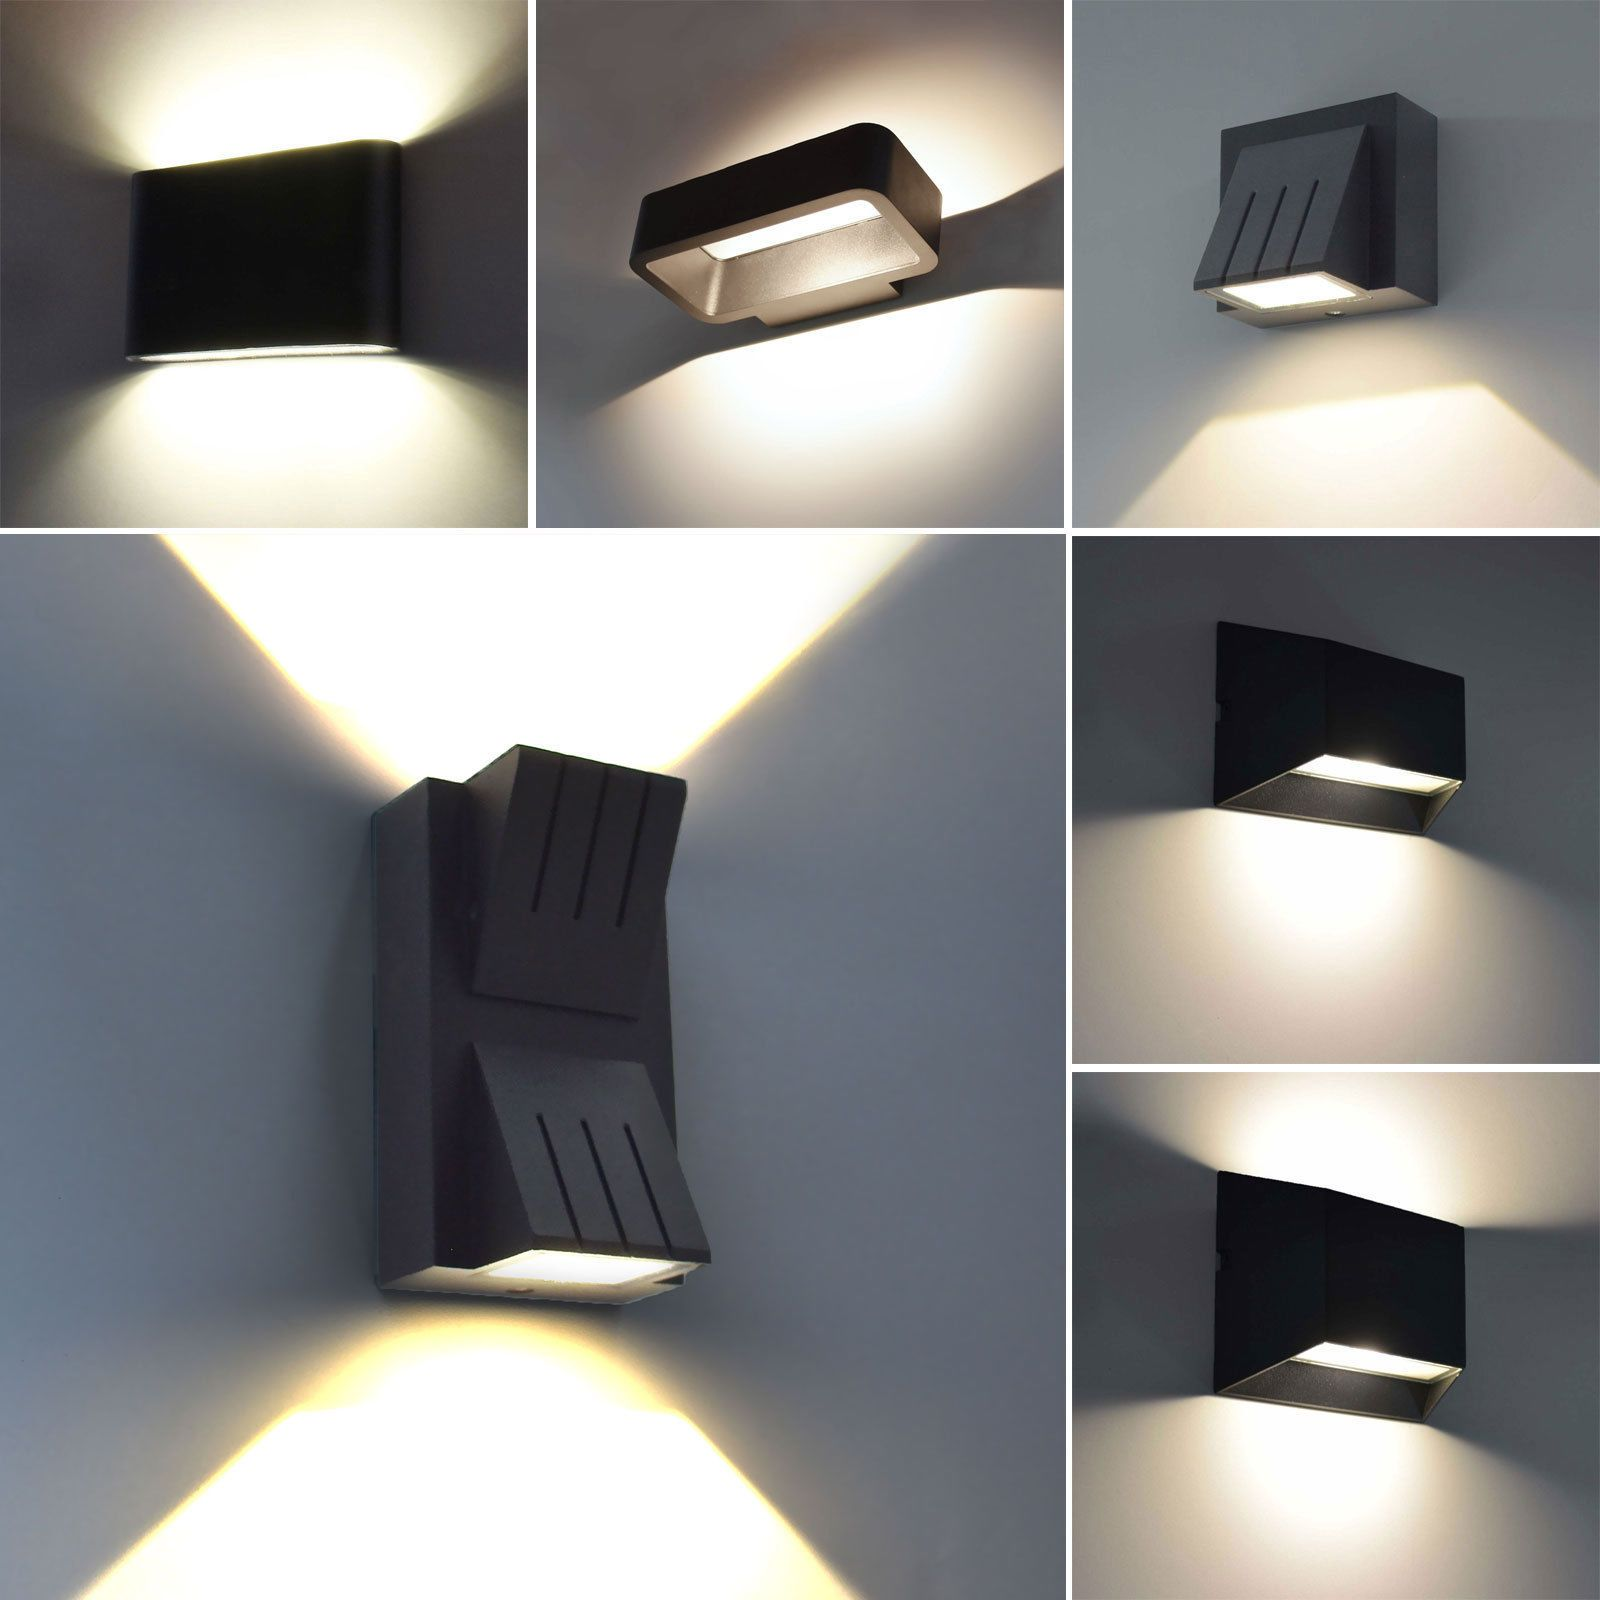 Moderne Led Aussenleuchte Wandleuchte Aussenlampe Up Down